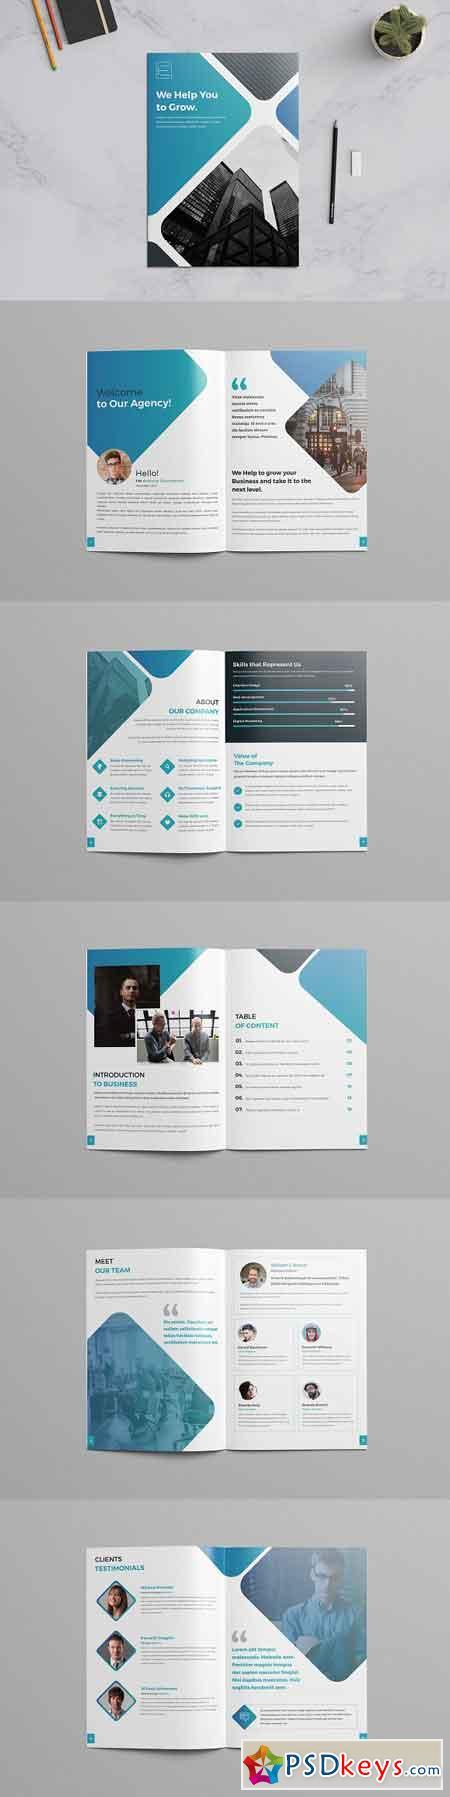 A4 Brochure Template 2920806